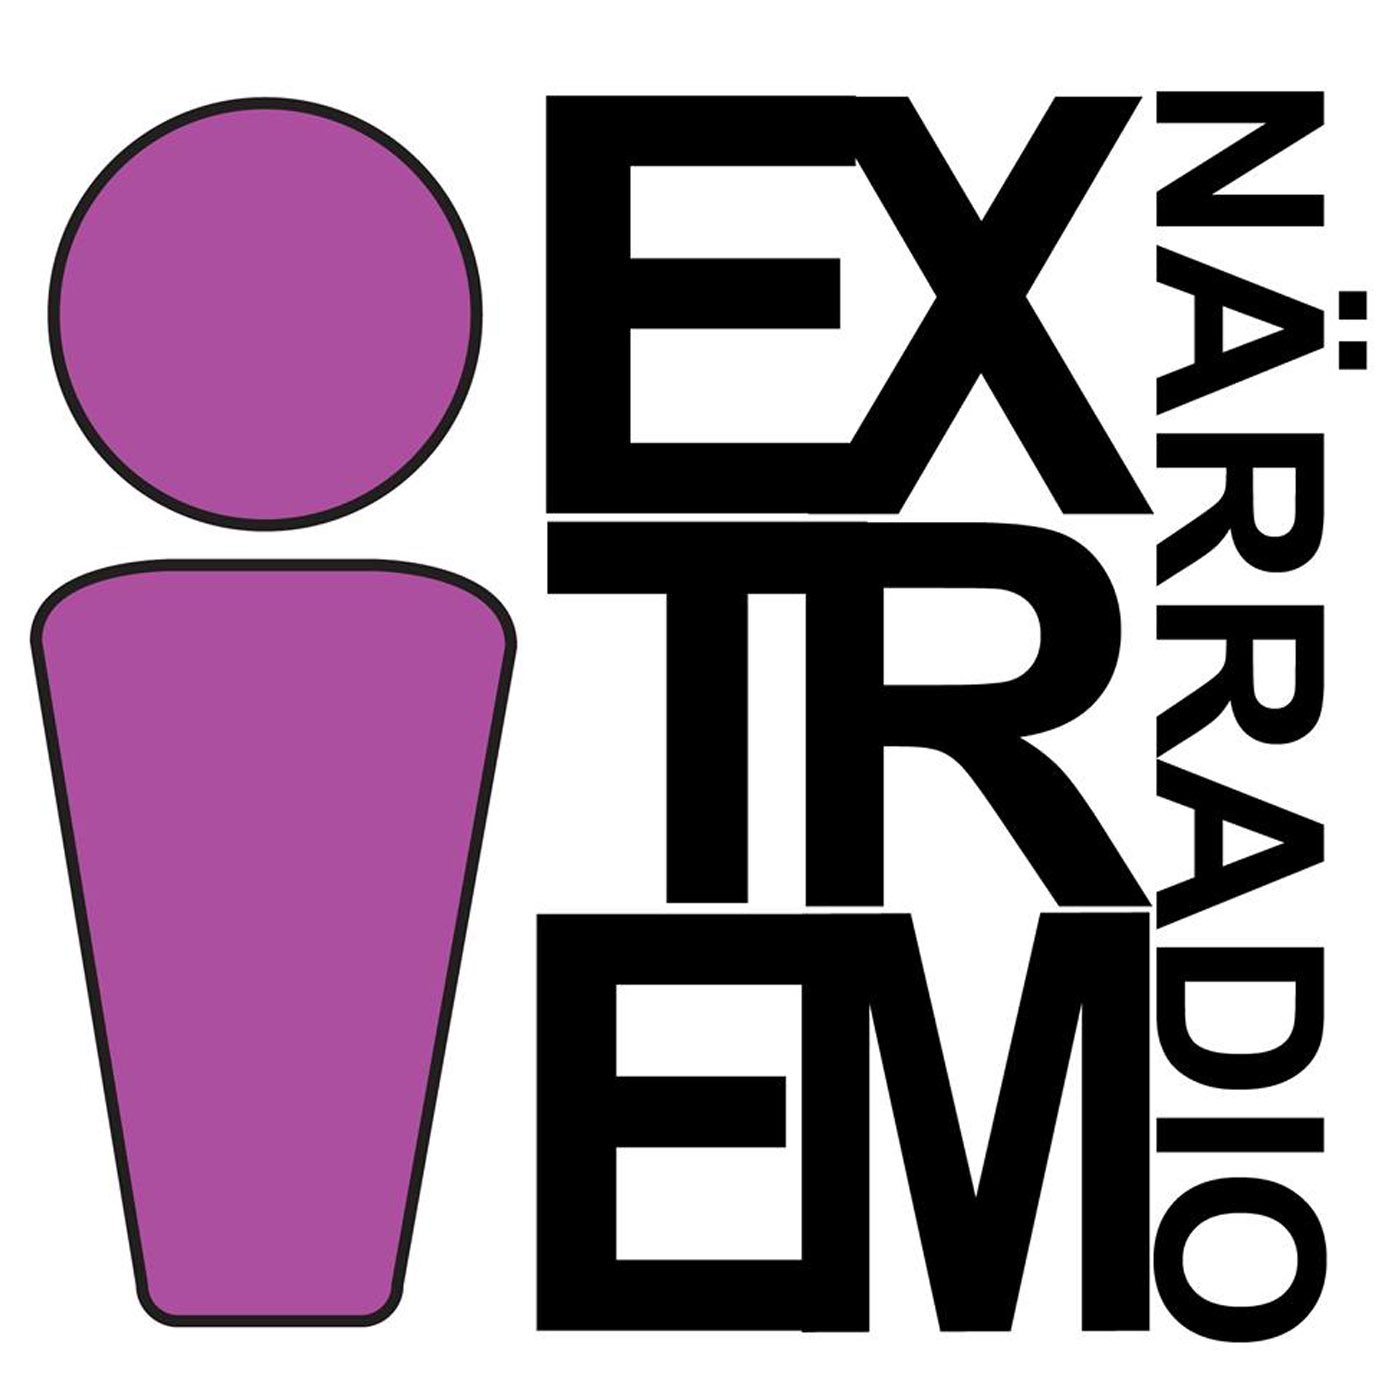 Extremnärradio